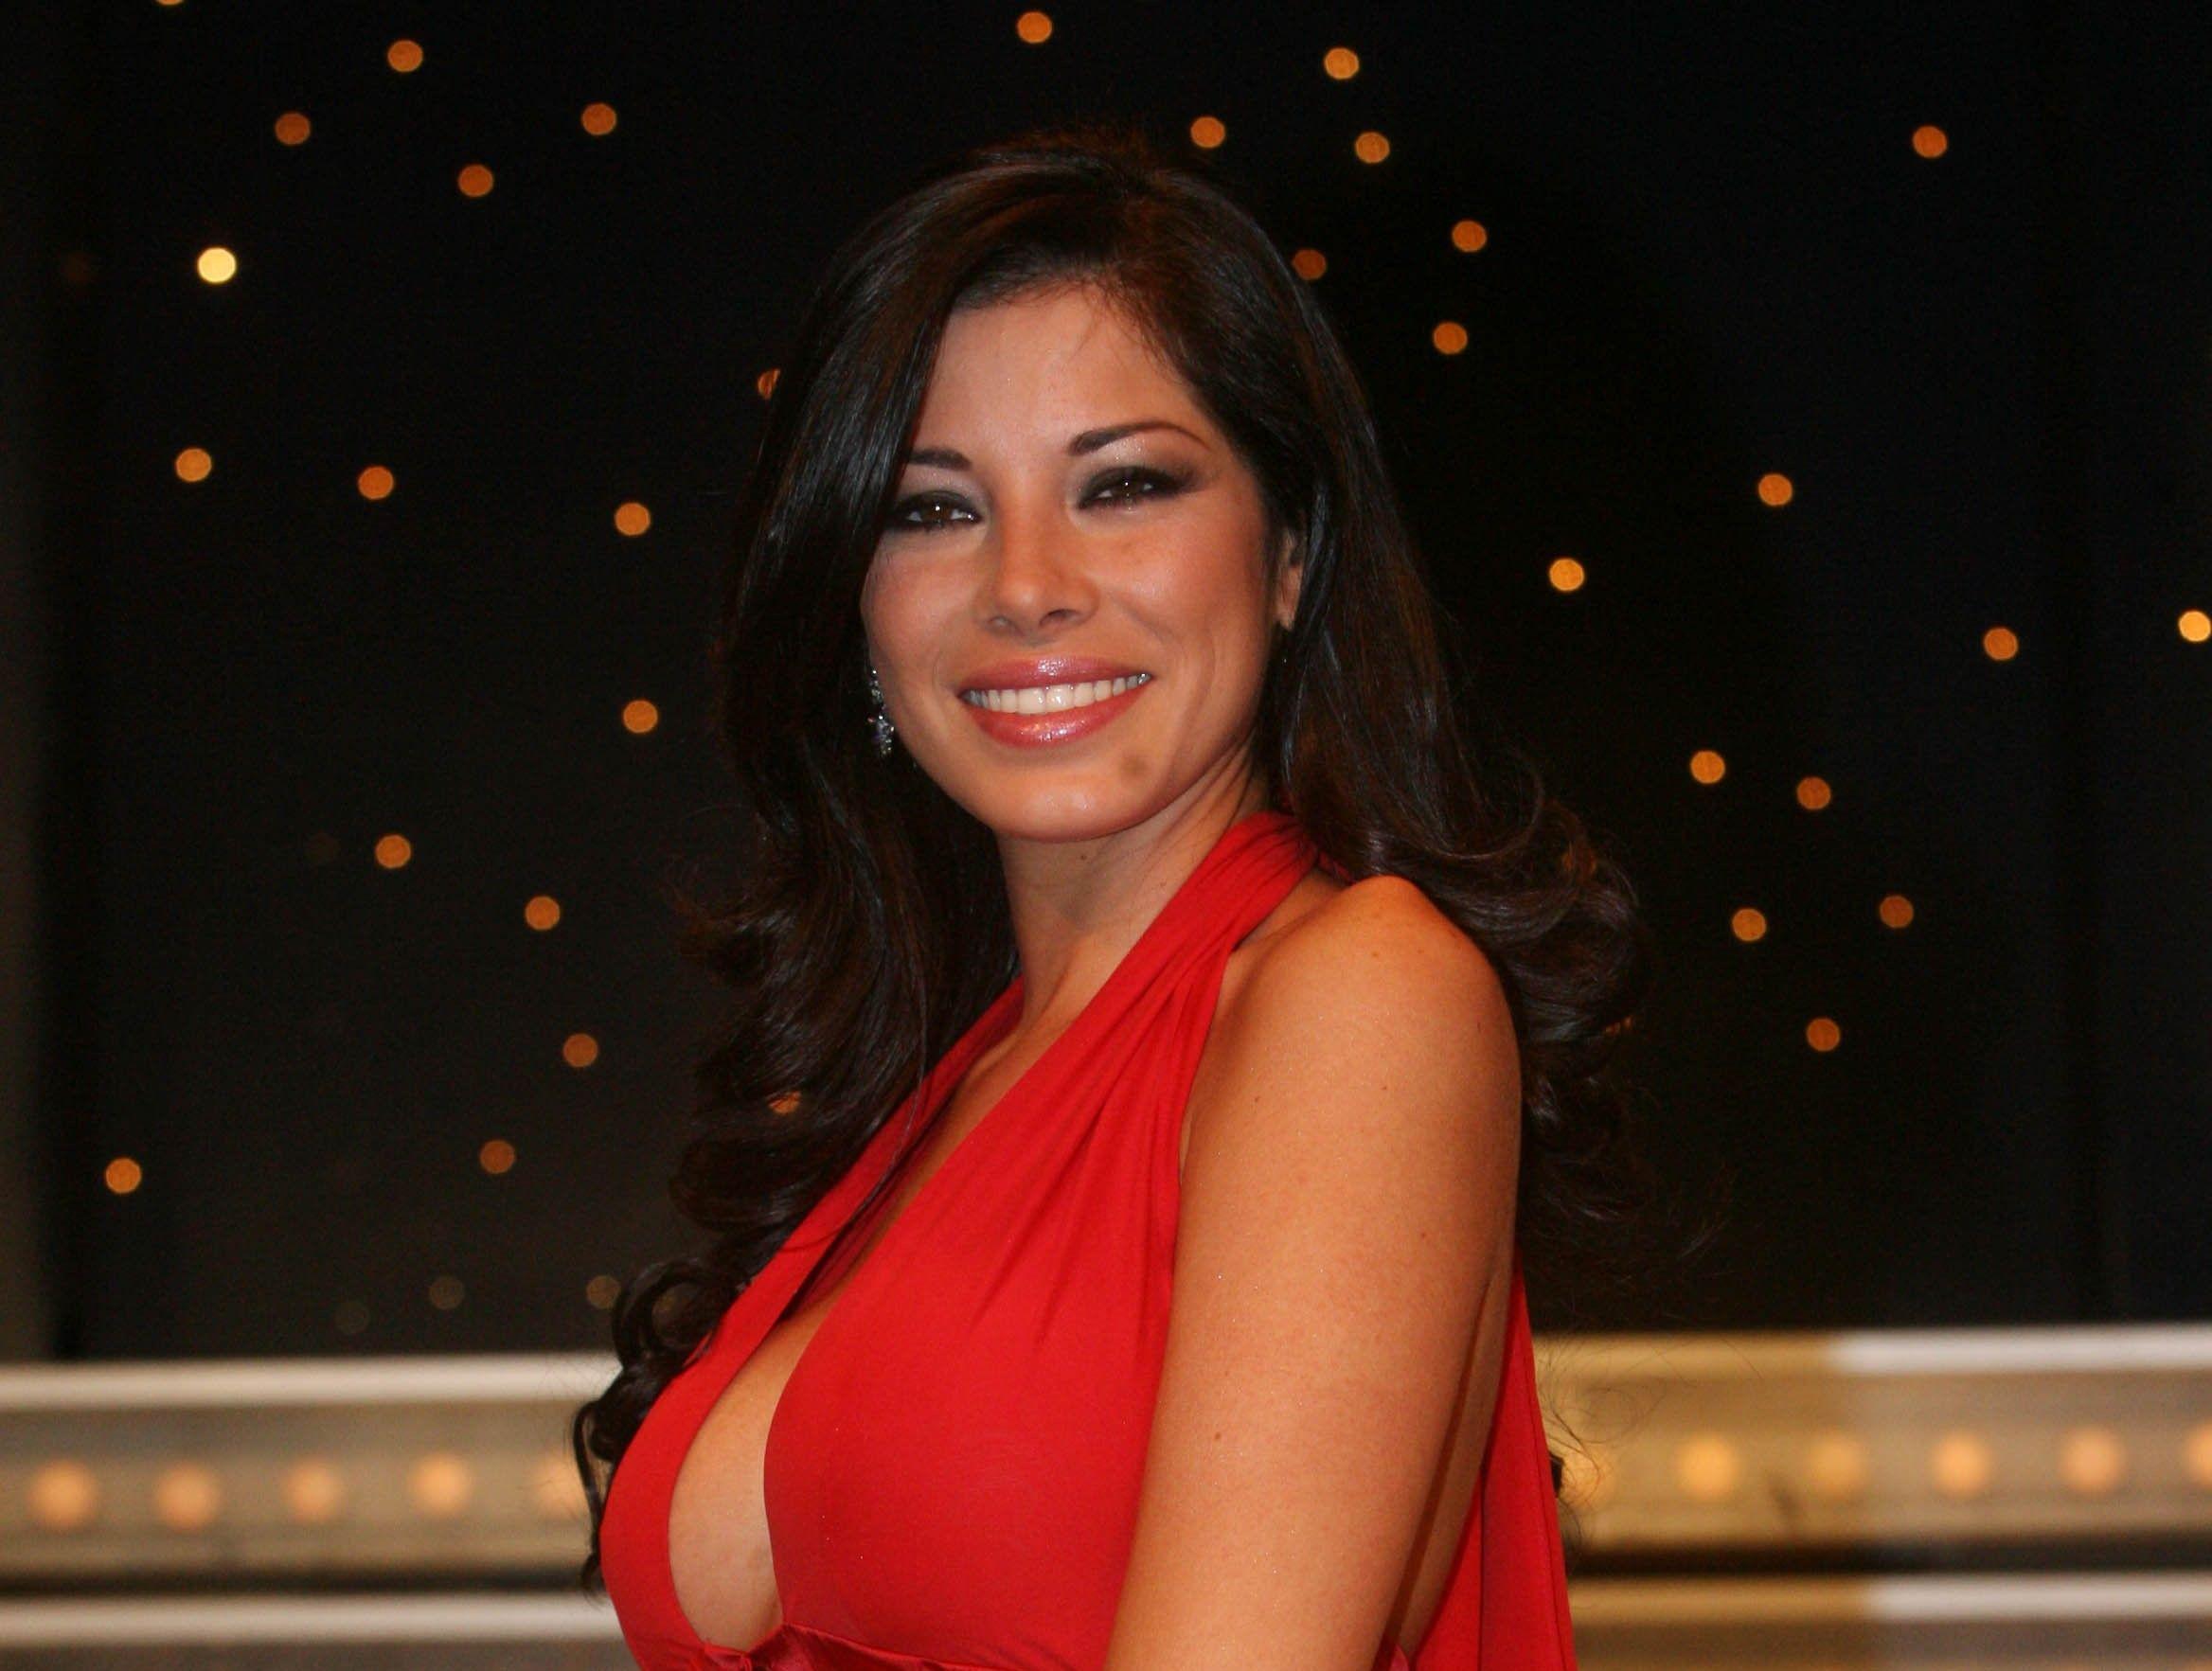 Aida Yespica tradita da Geppi Lama sbotta sui social: 'Idiota io un'altra volta!'